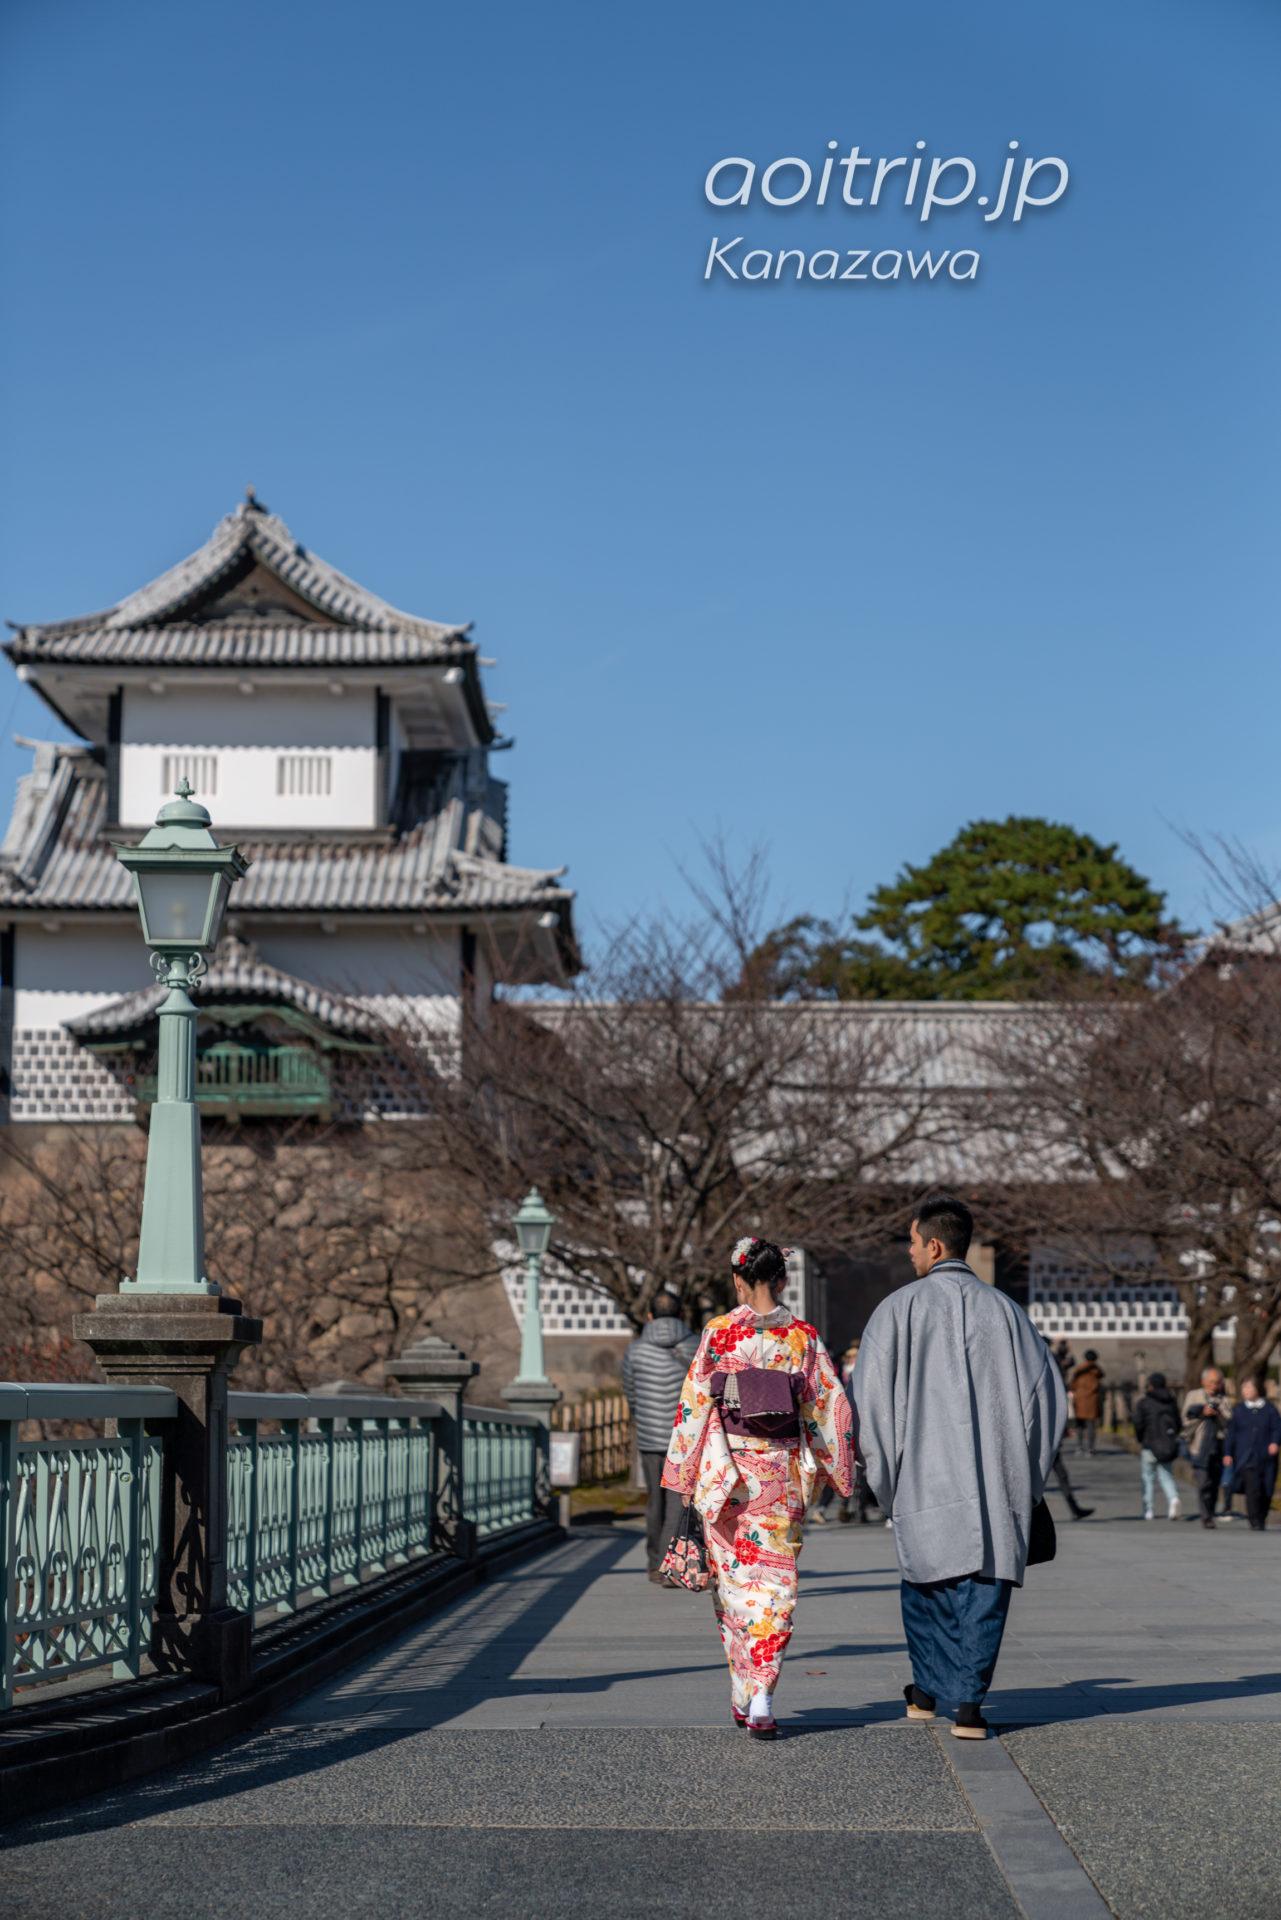 秋の金沢城公園 Kanazawa Castle Park in Autumn